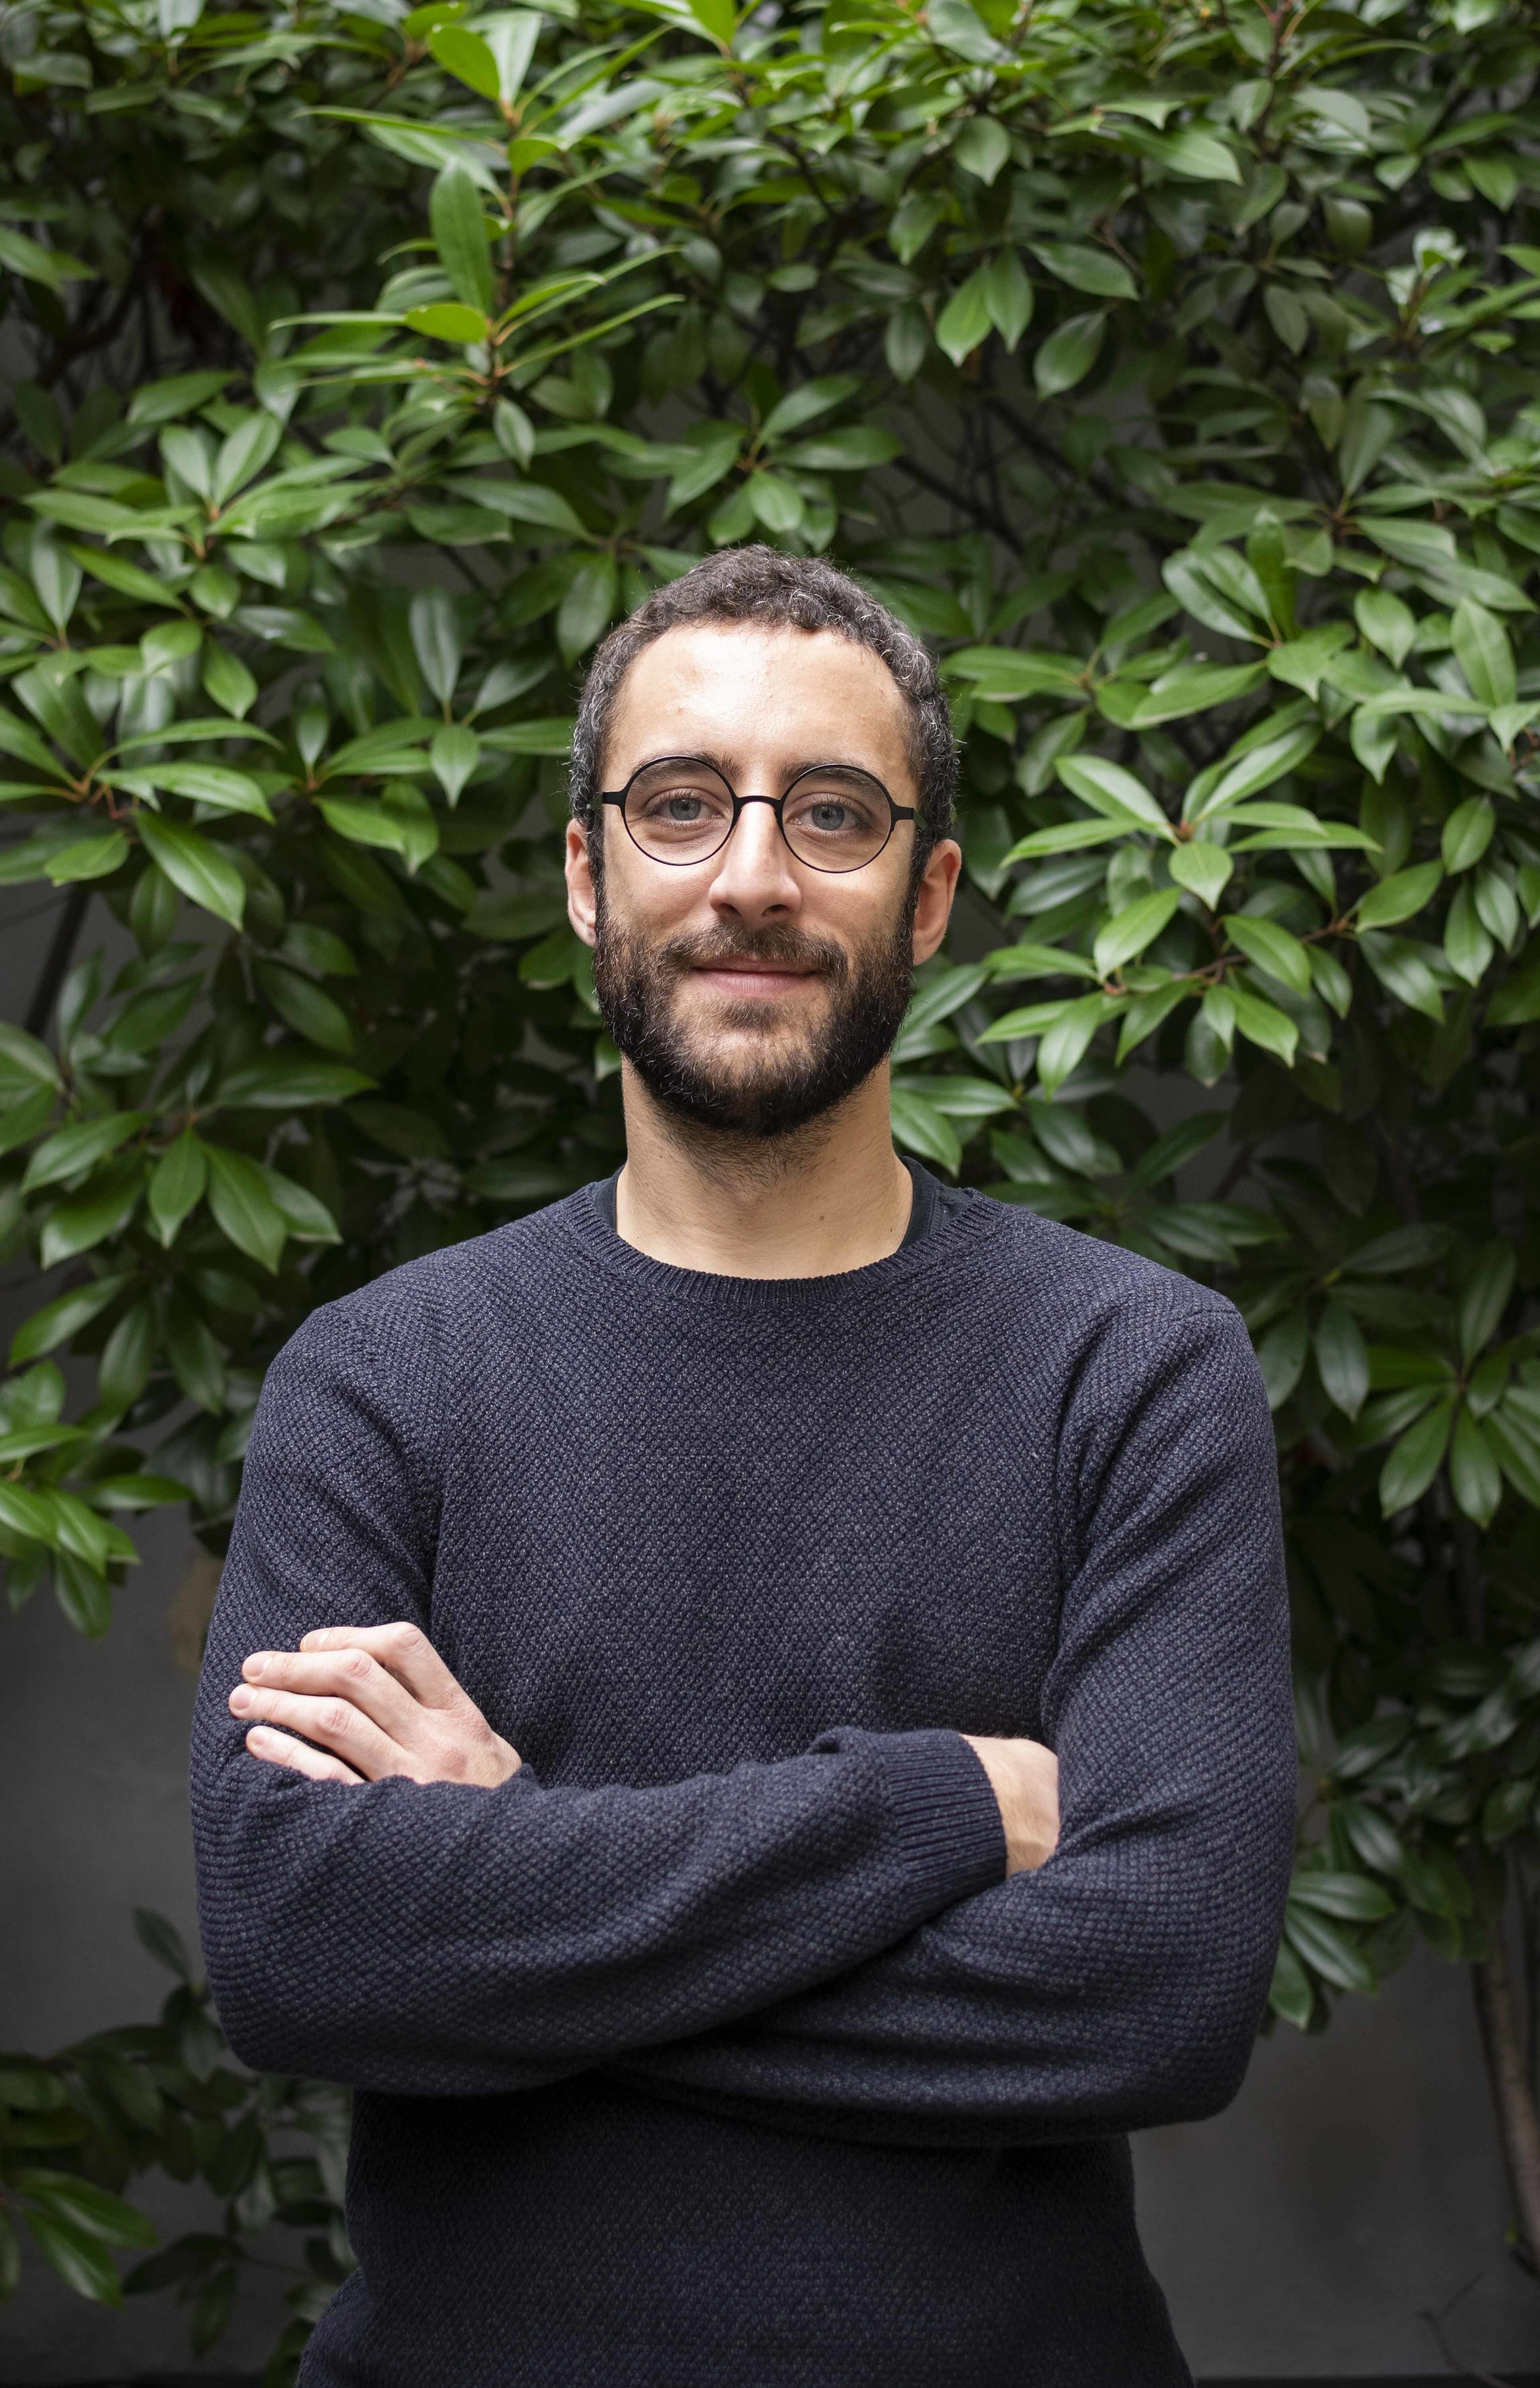 Tommaso Lorenzetti Architekt